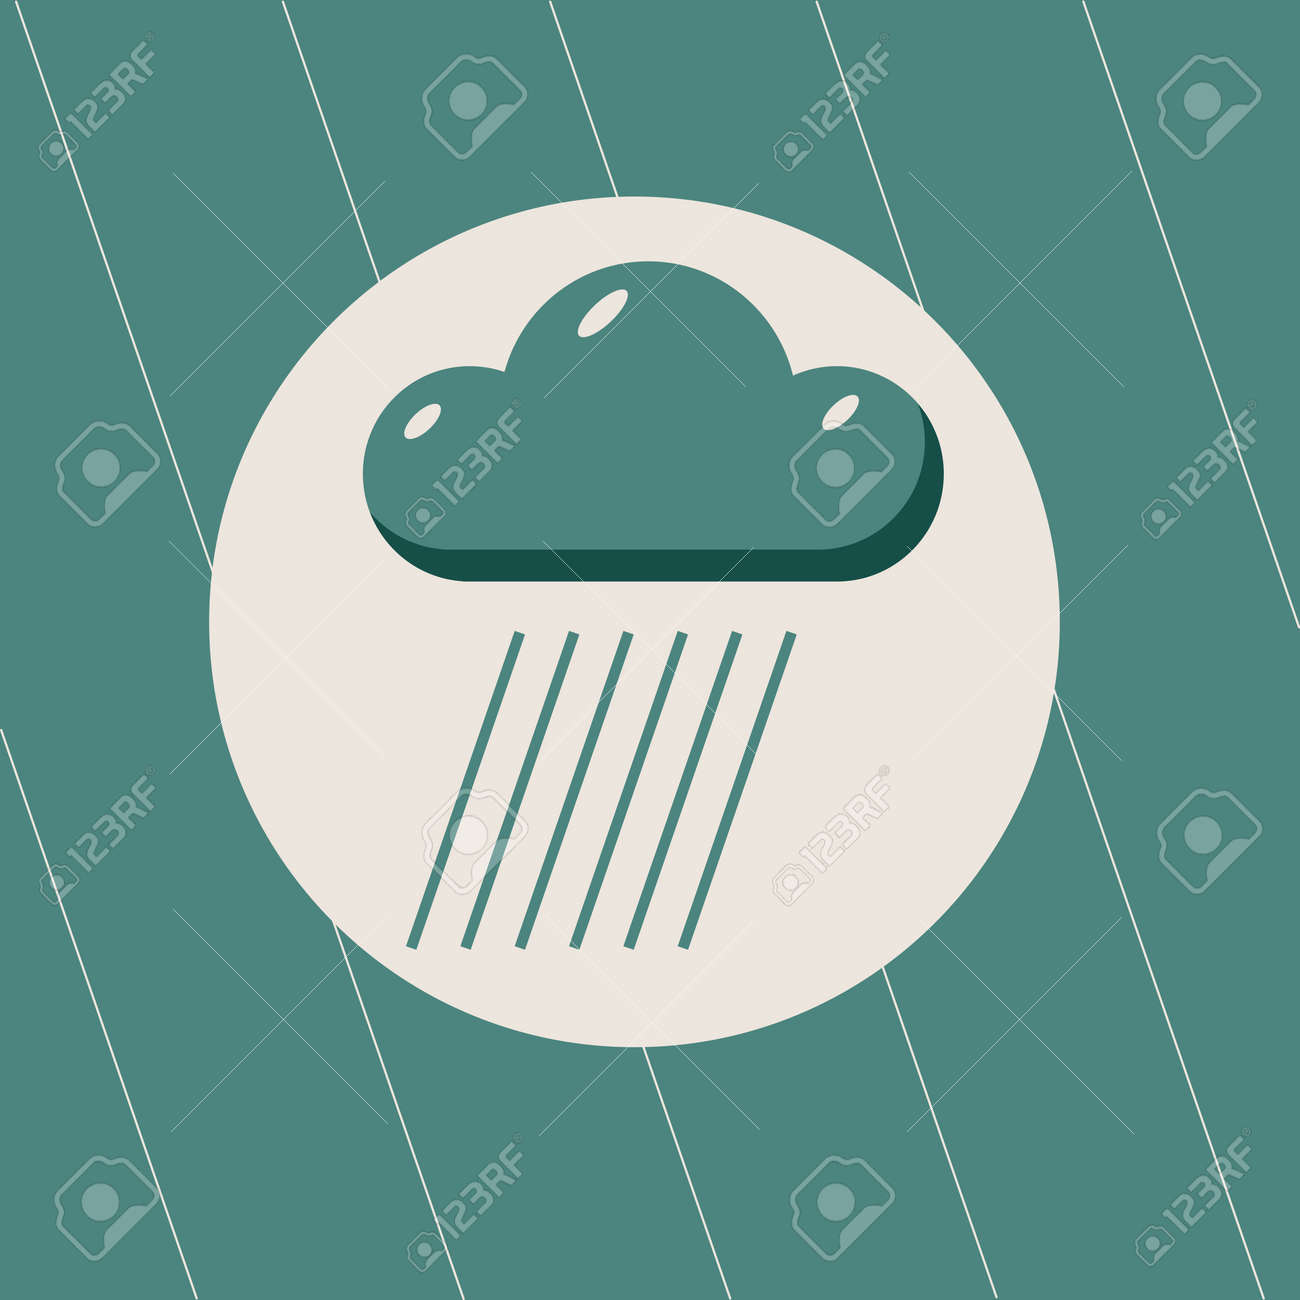 raining weather symbol of heavy rain royalty free cliparts